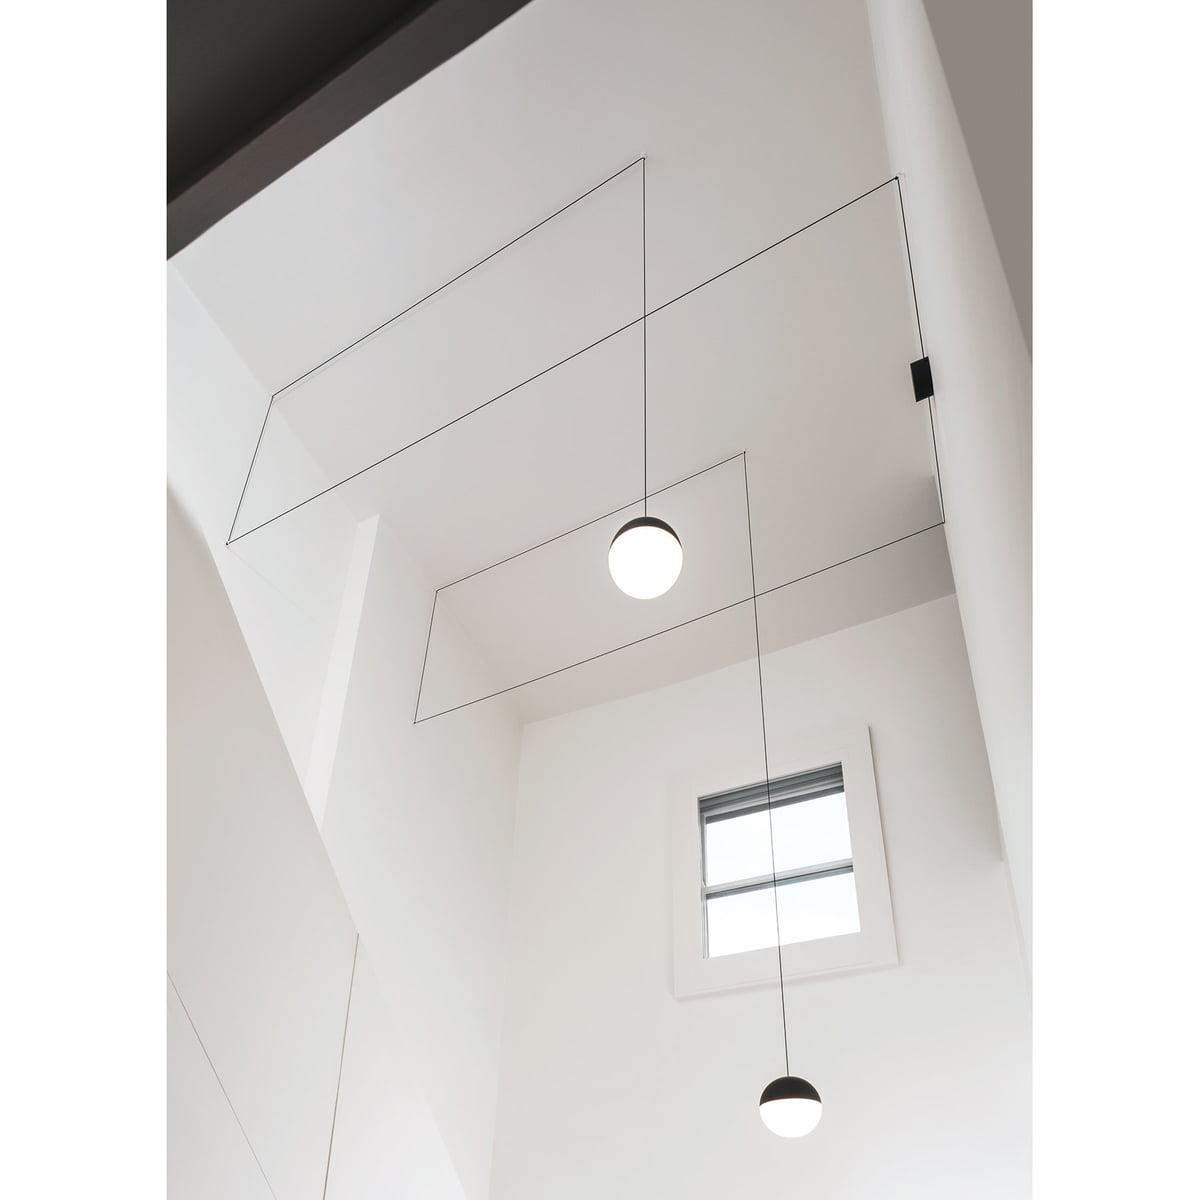 Flos string light pendant lamp spherical head flos string light pendant lamp spherical head mozeypictures Images